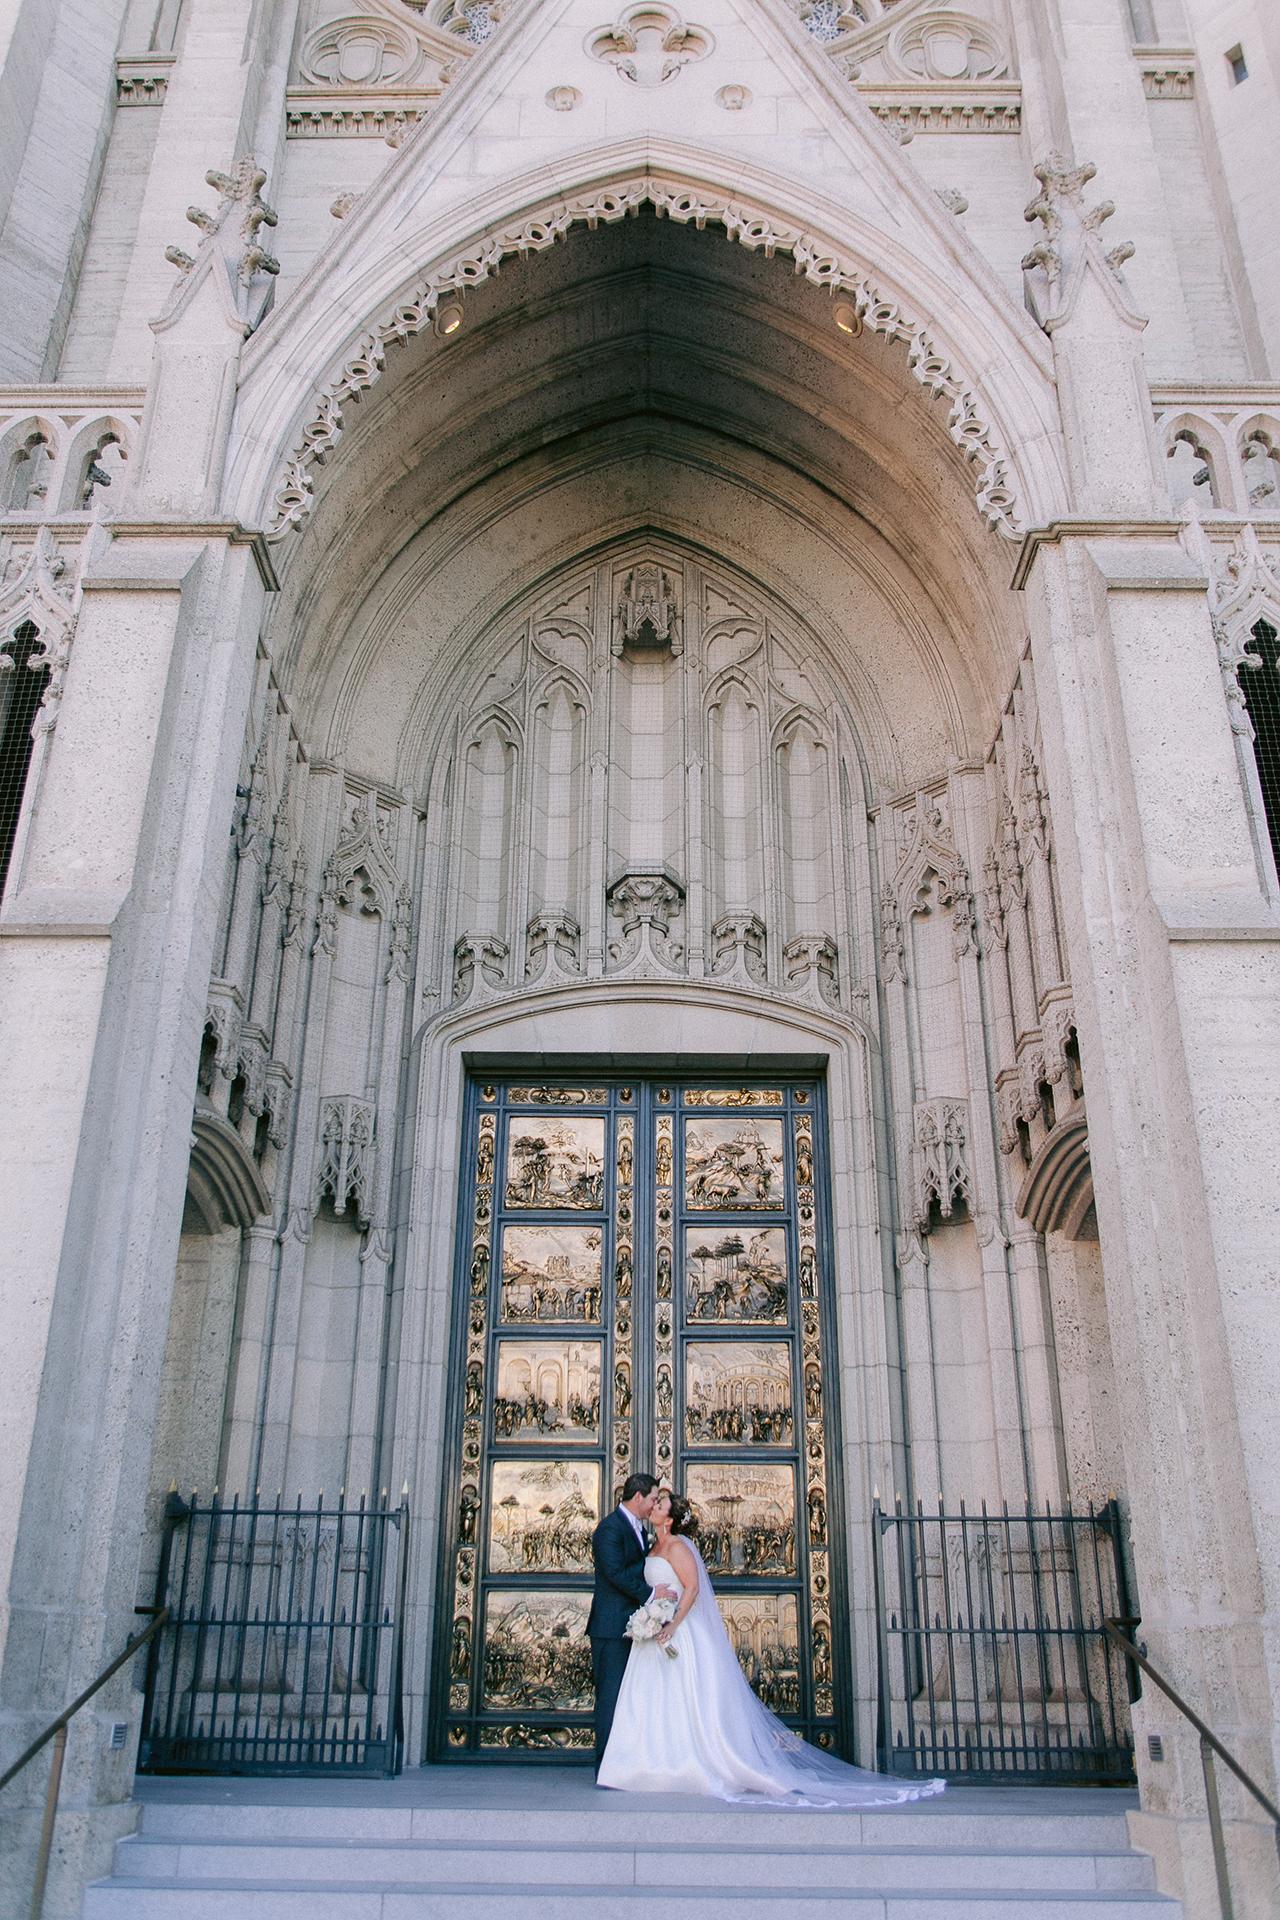 Grace_Cathedral_Tarra_Gallery_Wedding_016.jpg